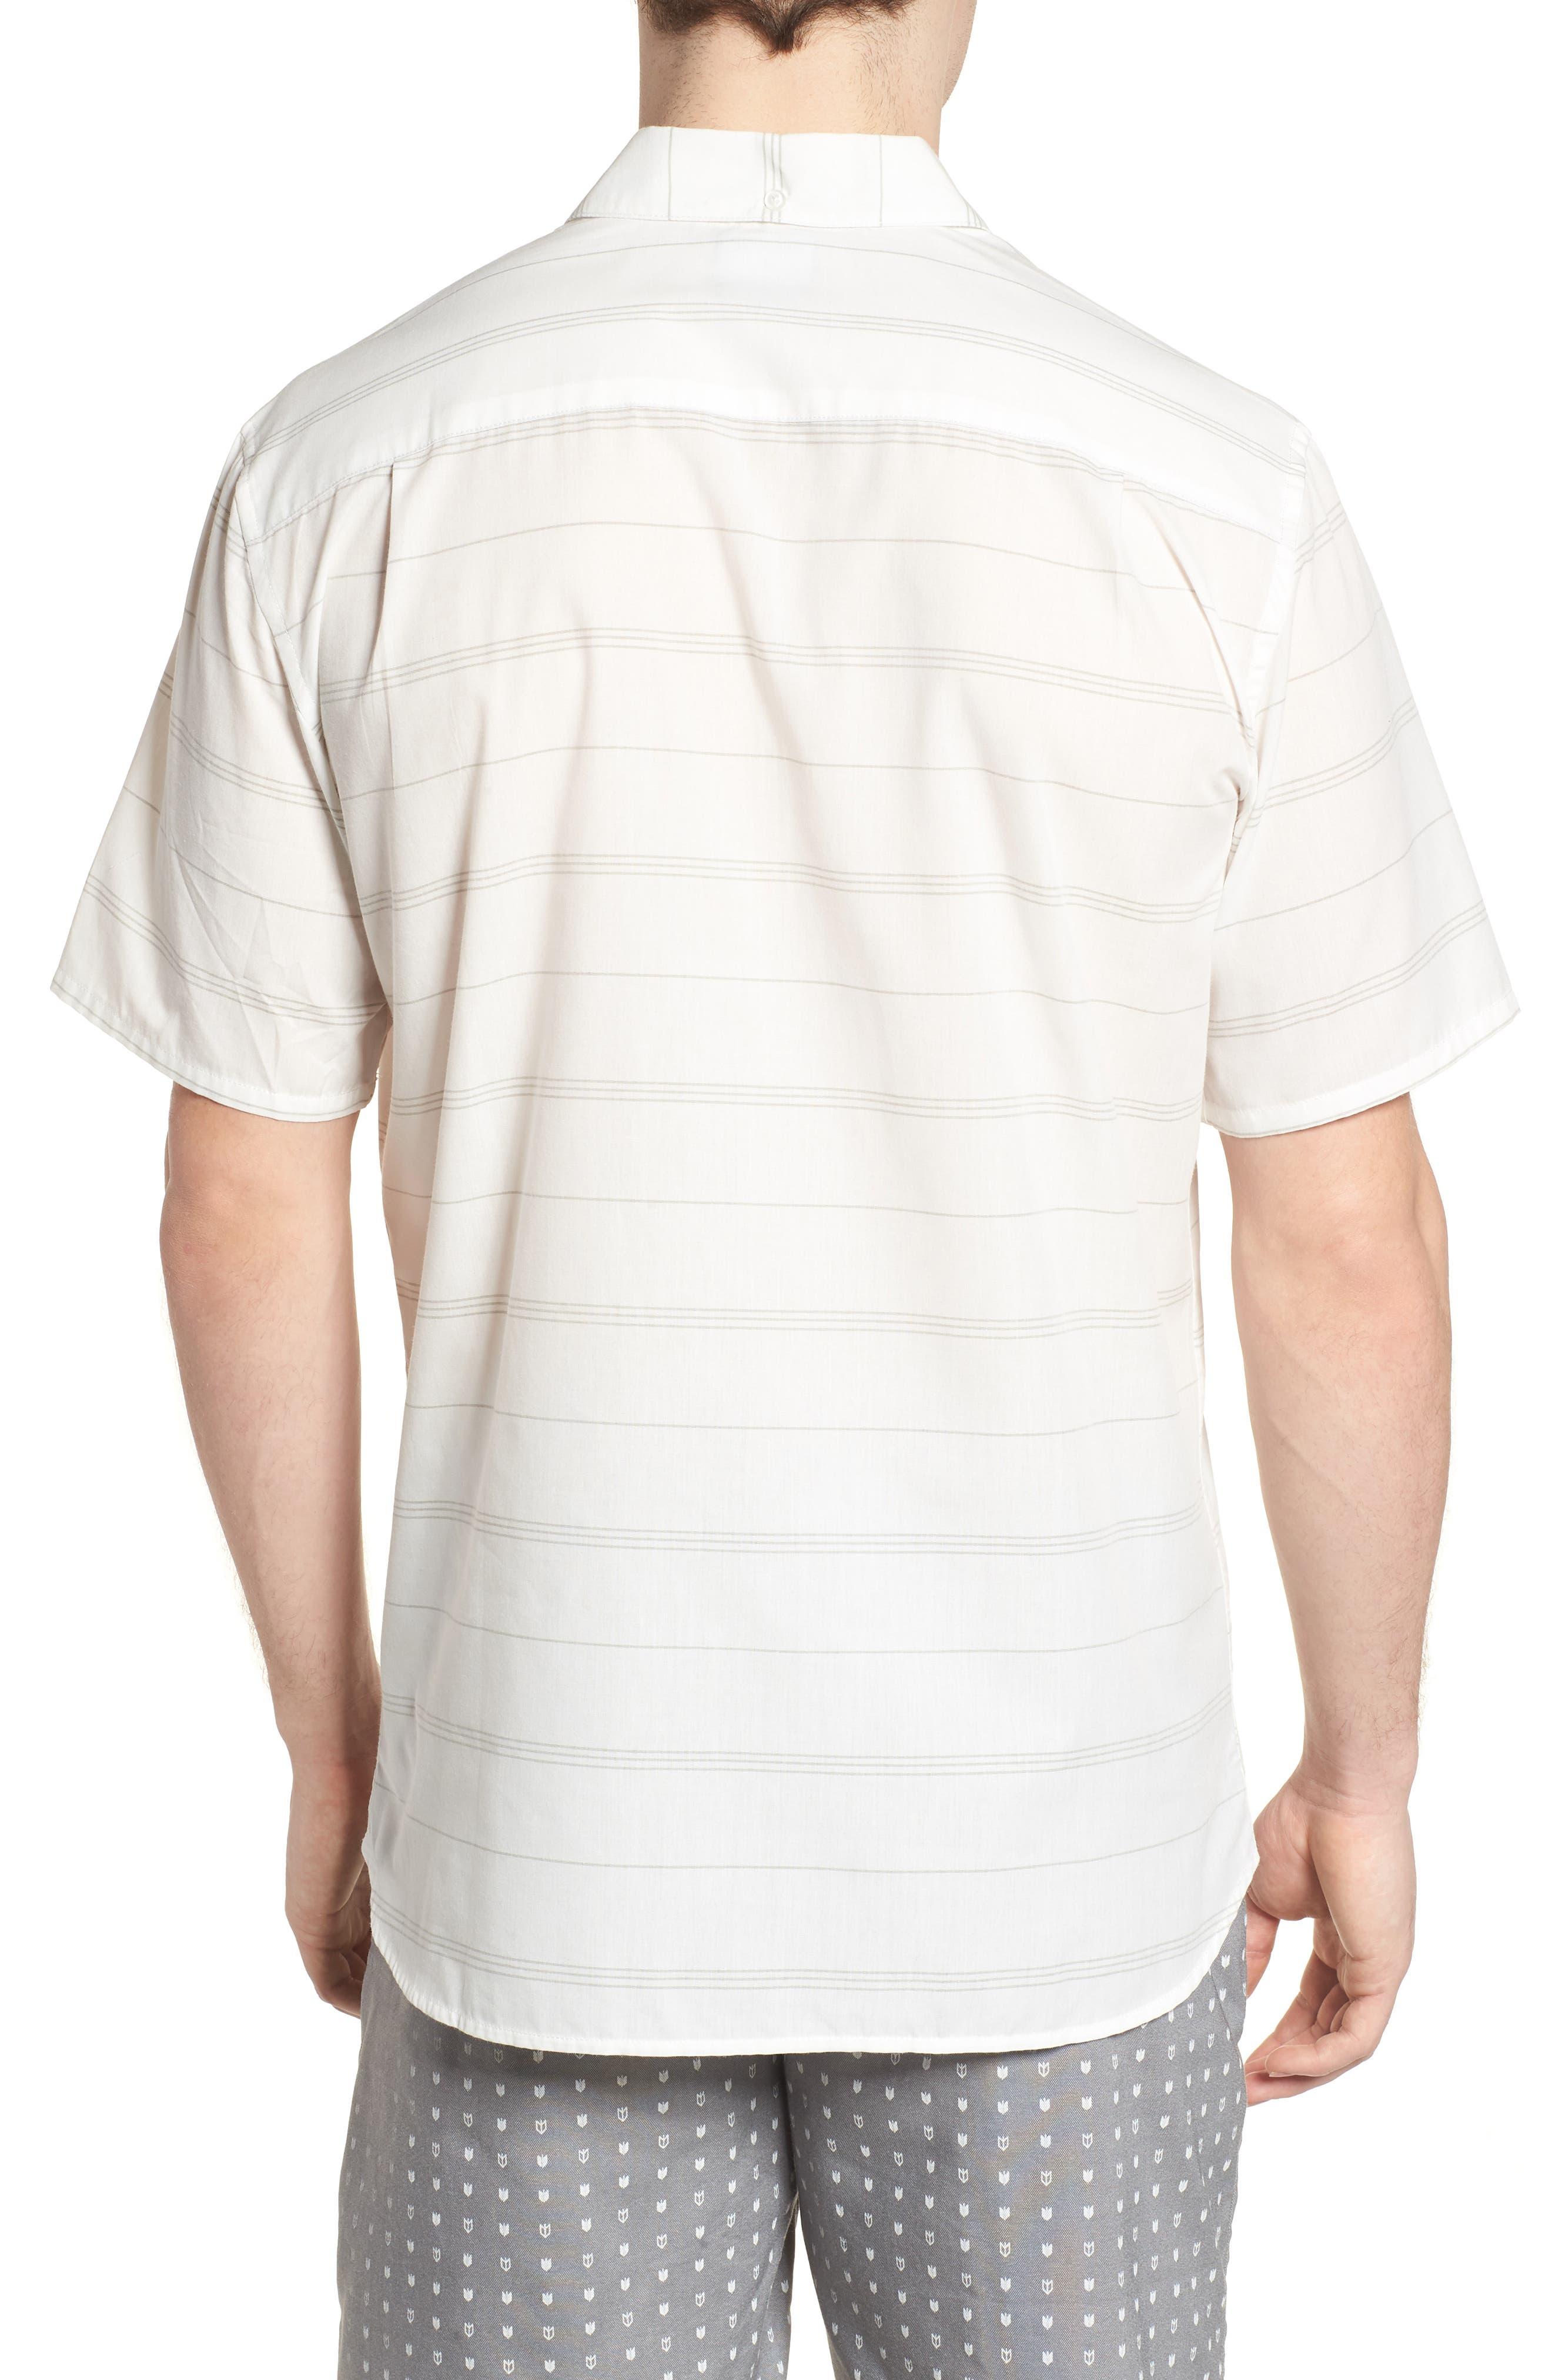 Dri-FIT Rhythm Shirt,                             Alternate thumbnail 3, color,                             Sail